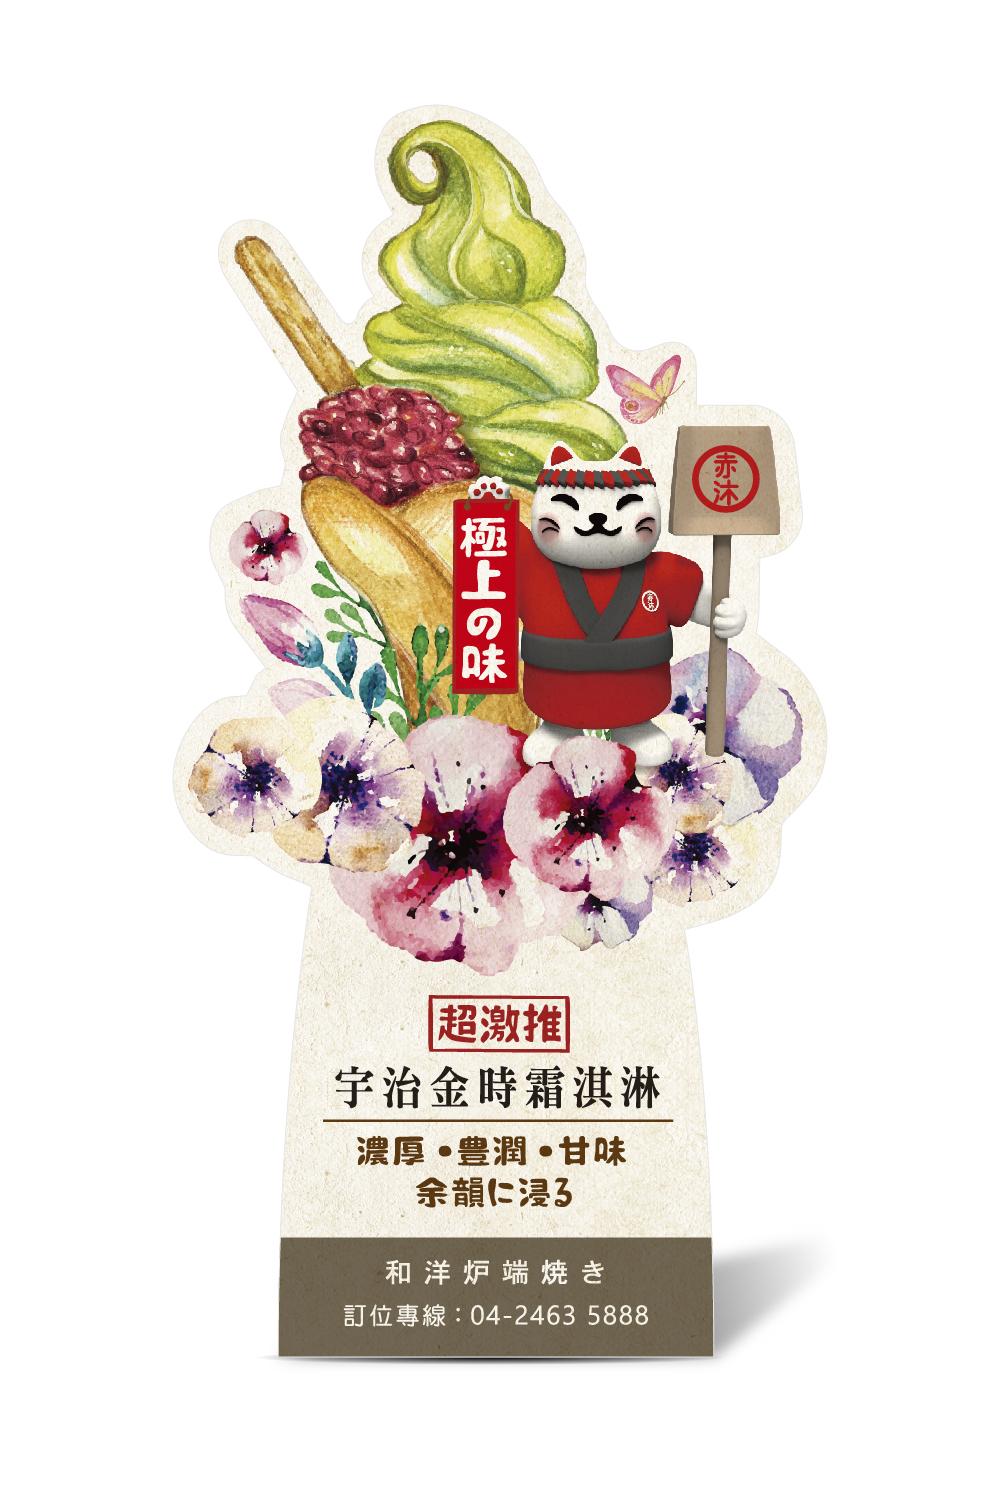 http://www.alabee.com.tw/wp-content/uploads/2020/03/taiko-matcha-ice-cream-02.jpg